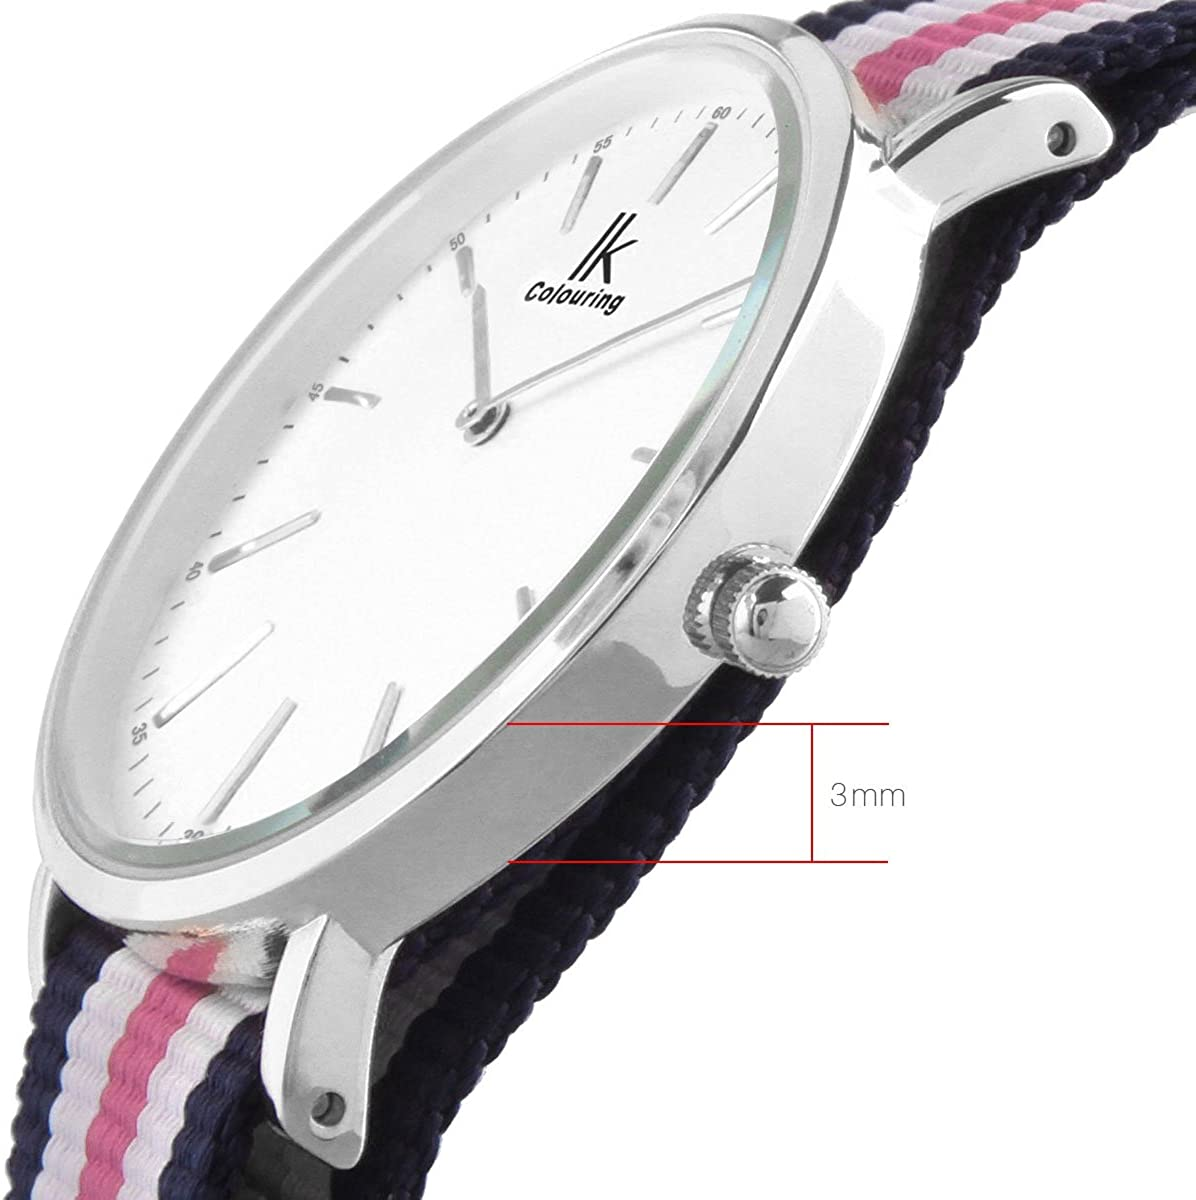 Alienwork IK Montre Femme Homme Bracelet Tissu NATO Nylon Quartz Ultra-Mince Boîtier Argent Φ 36mm/Bracelet Bleu-rose